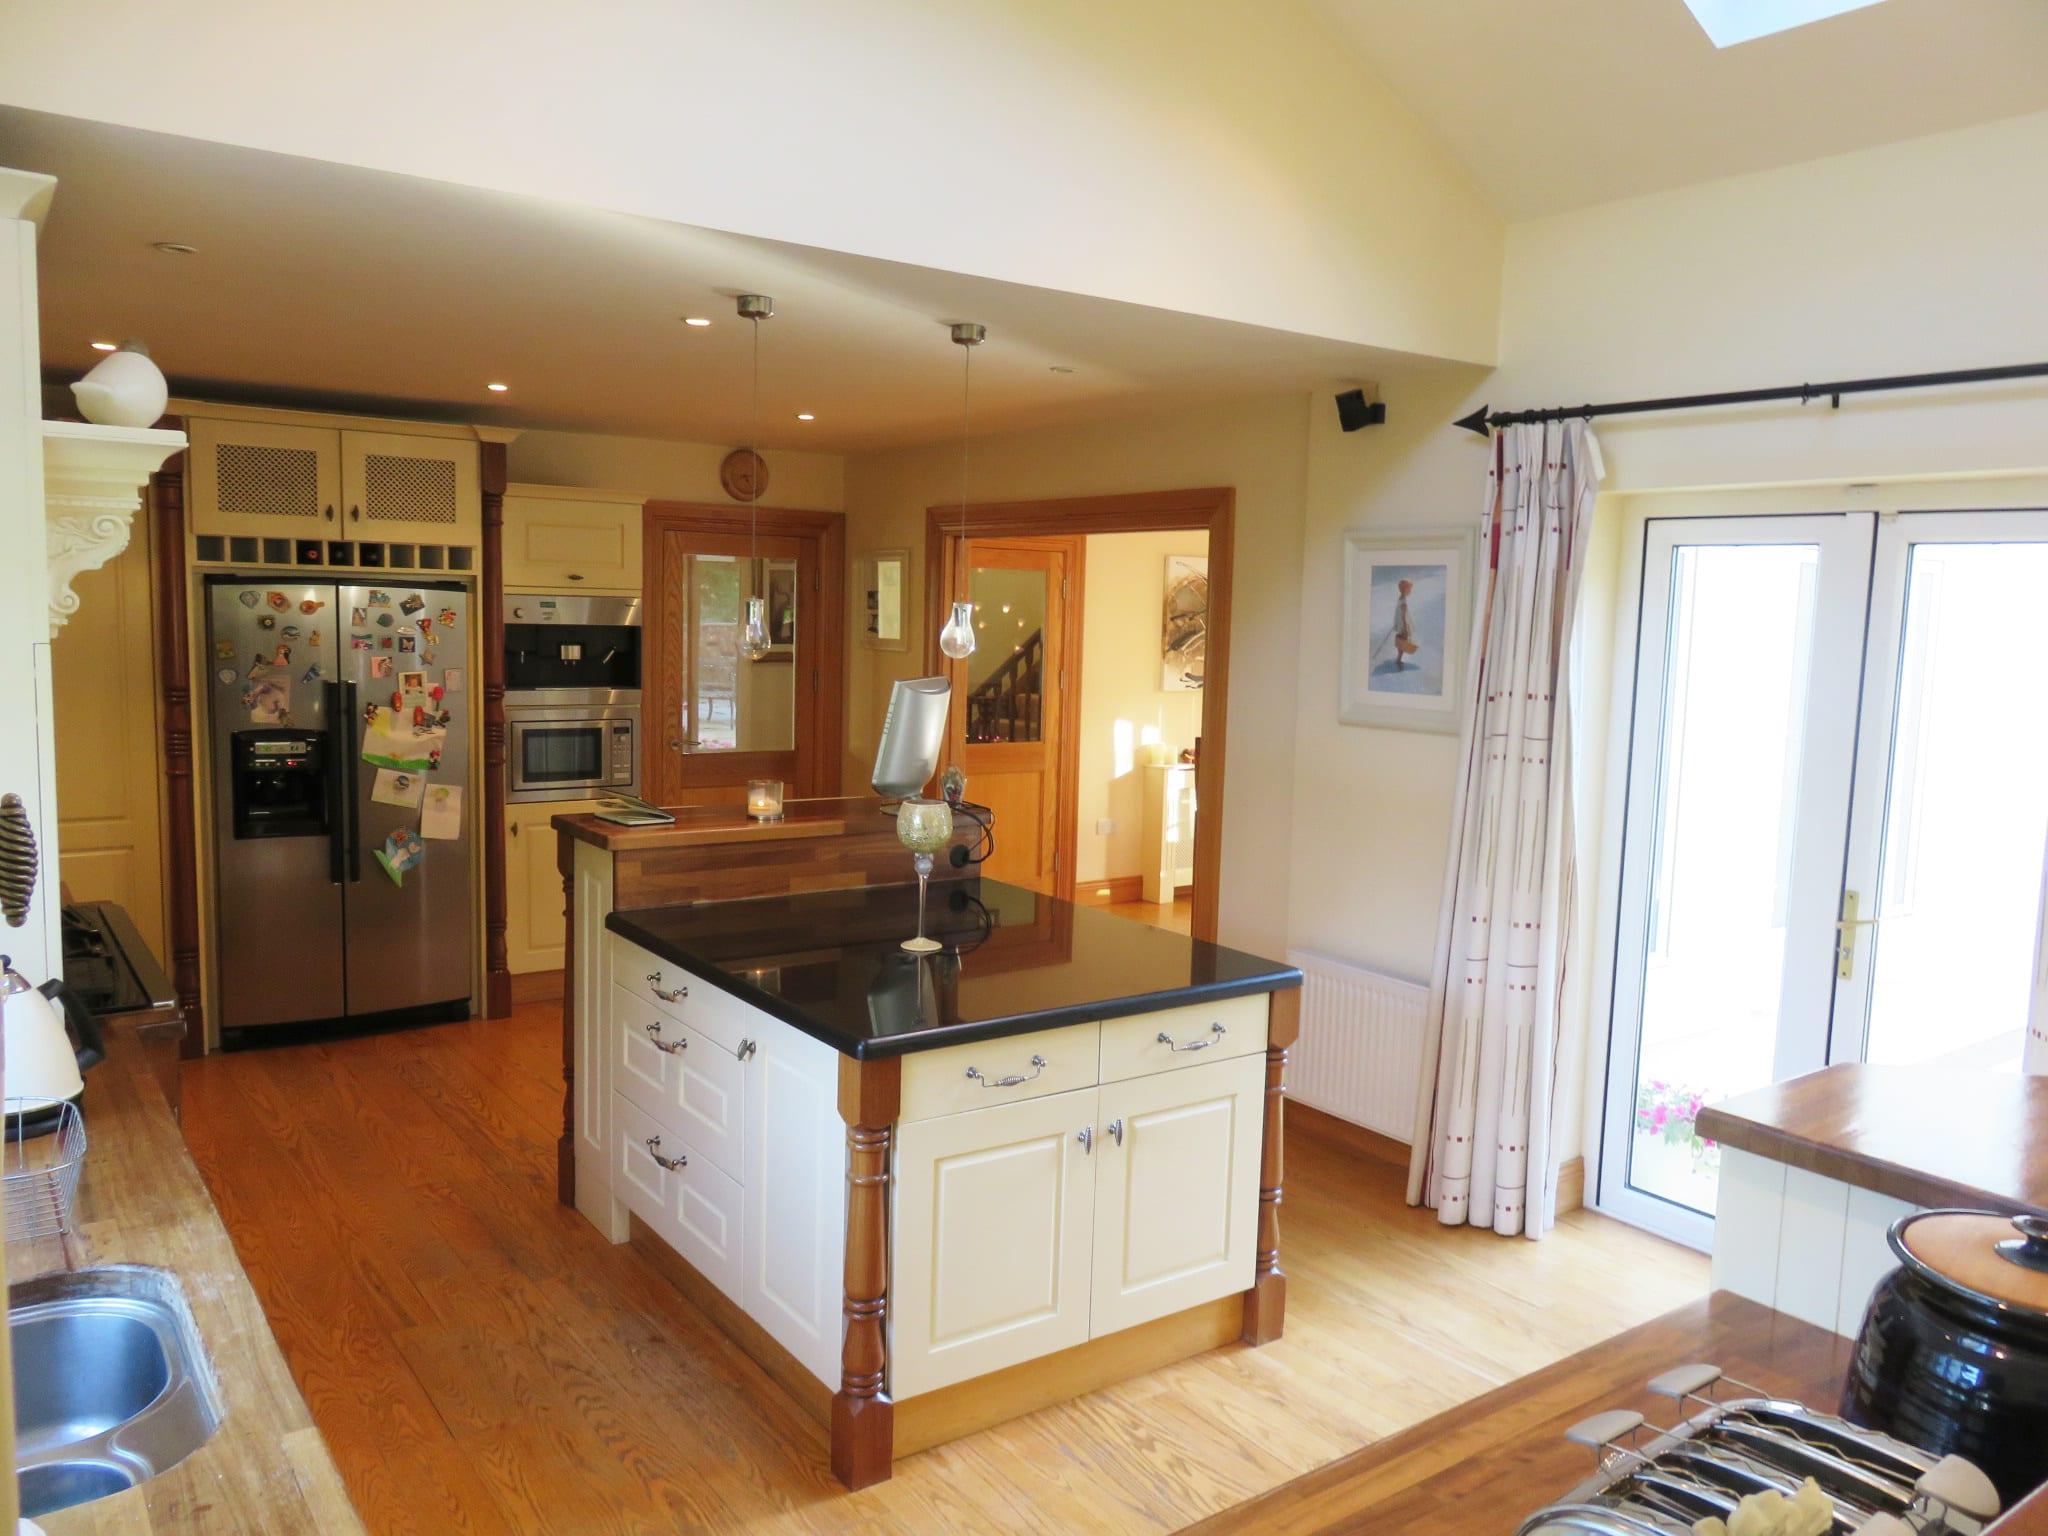 Kitchen IMG_7520